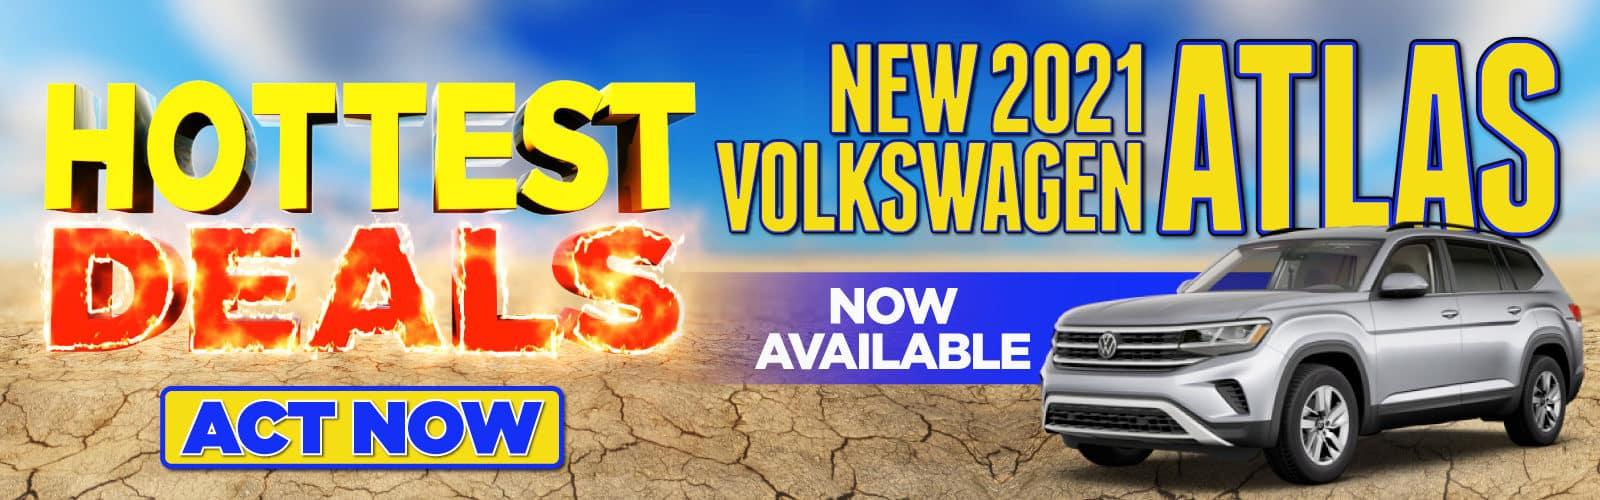 New 2021 VW Atlas Now In Stock - Act Now